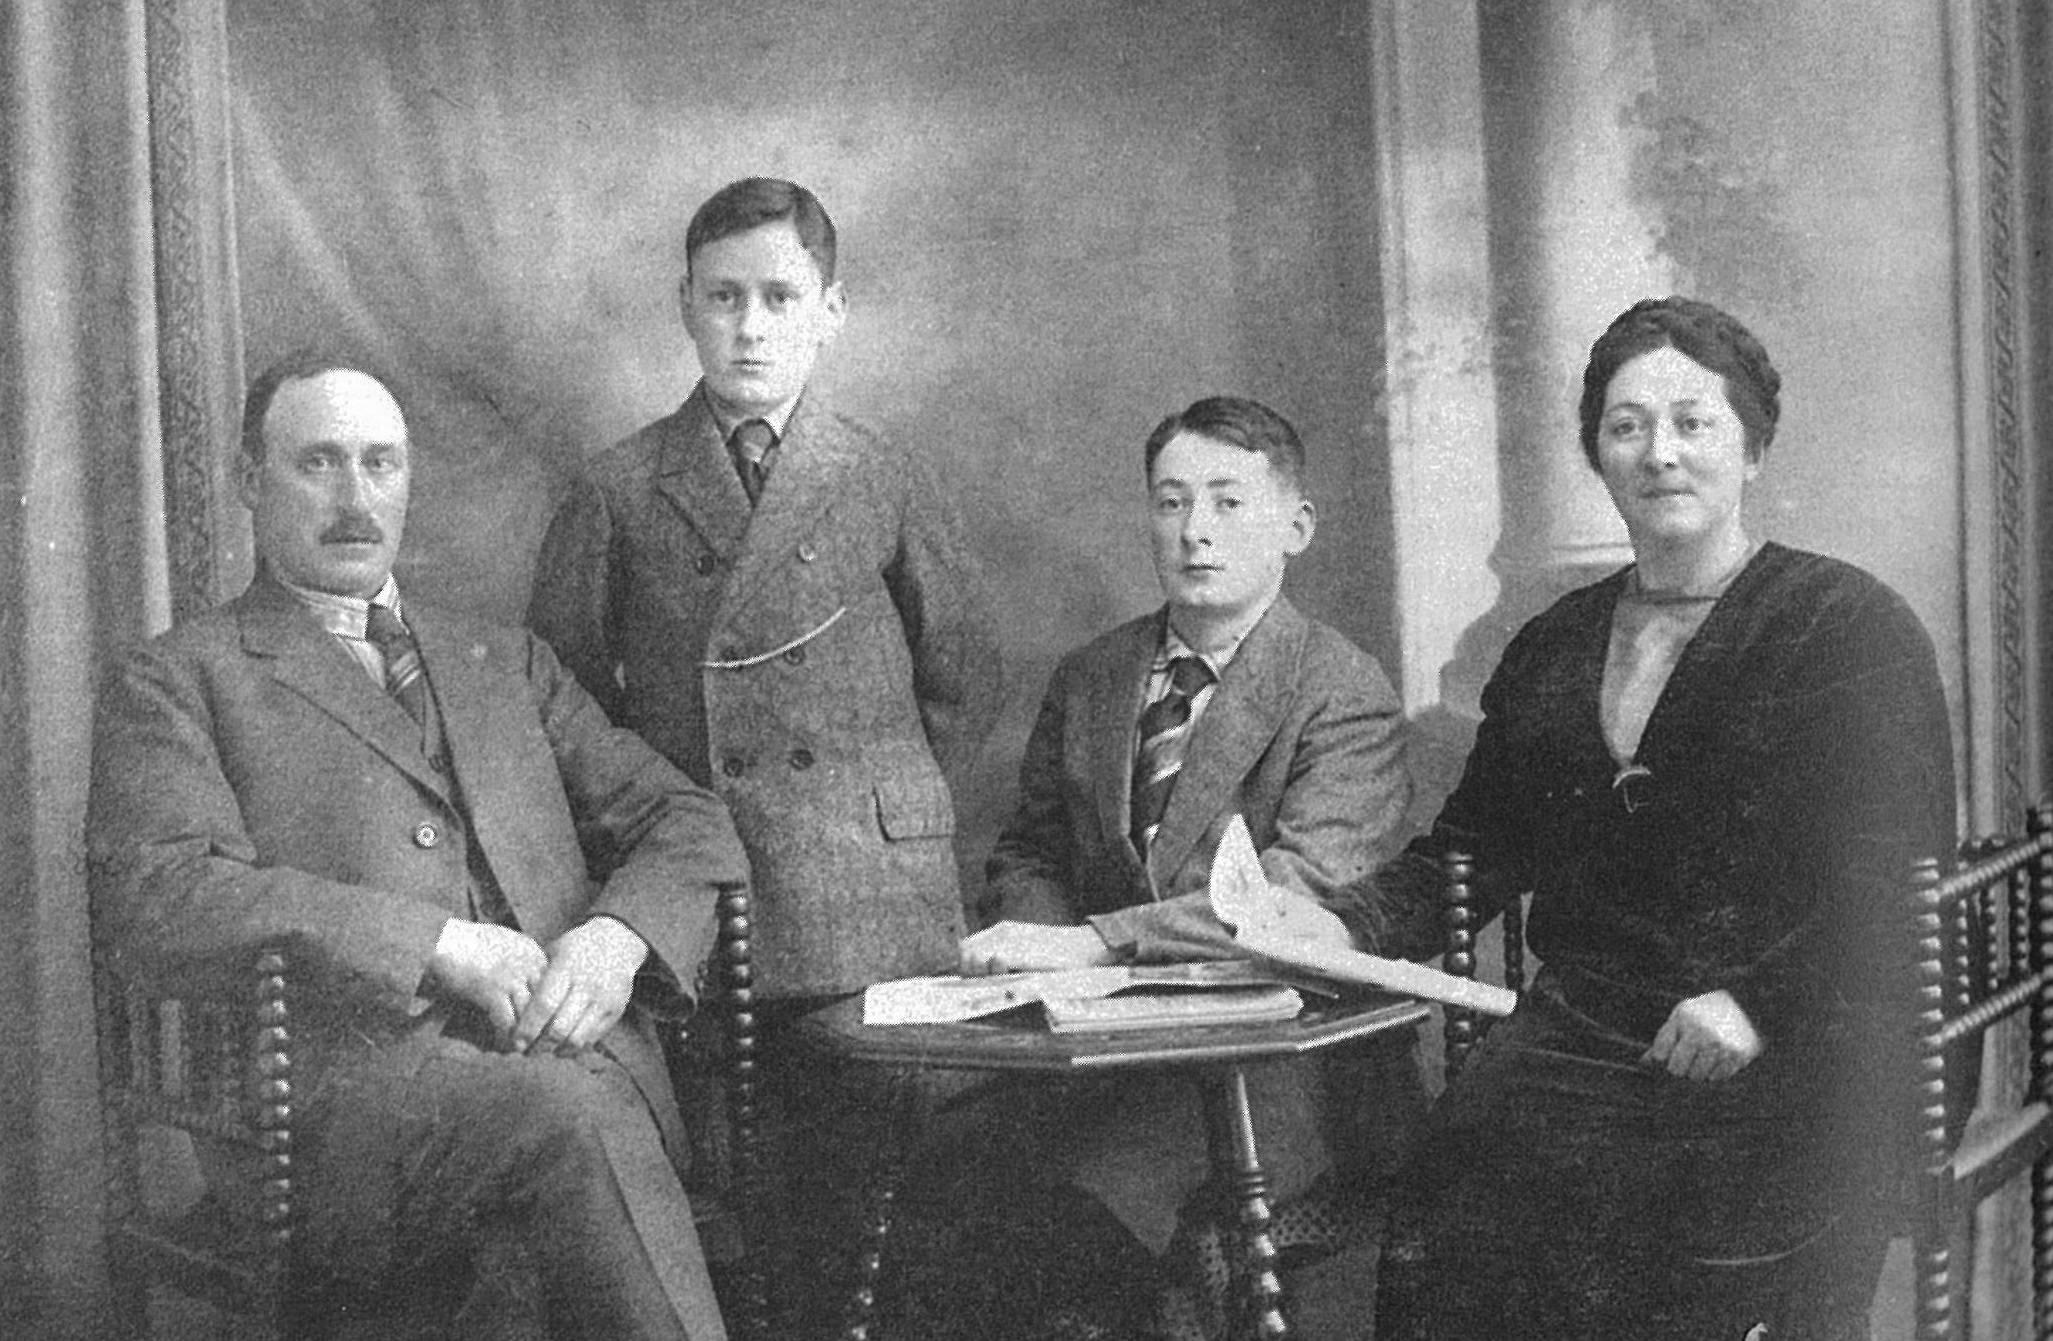 De familie Gudema